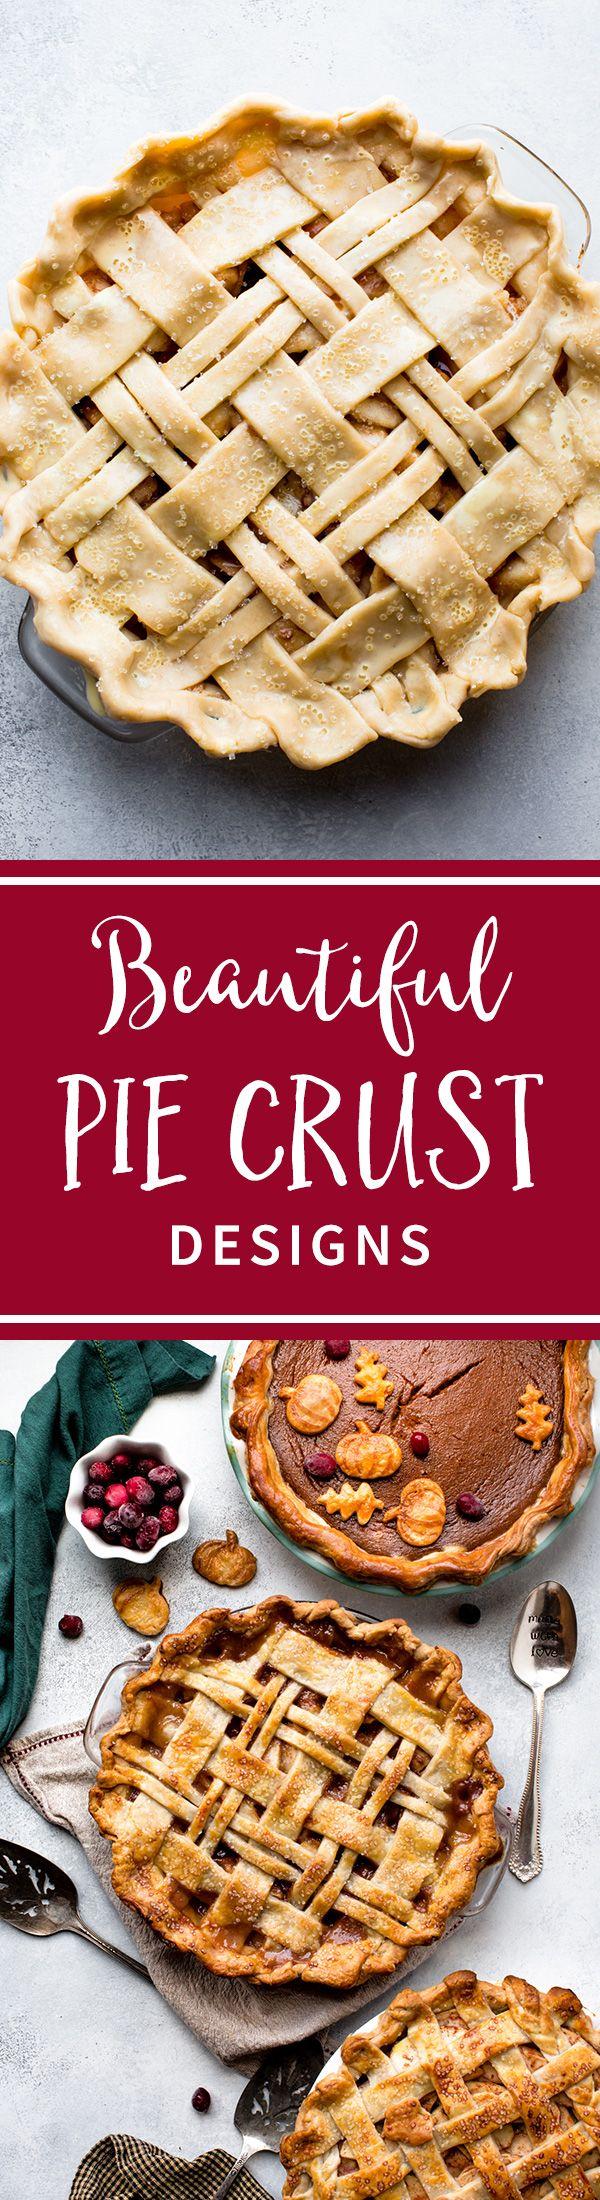 Inspiring pie crust designs on sallysbakingaddiction.com